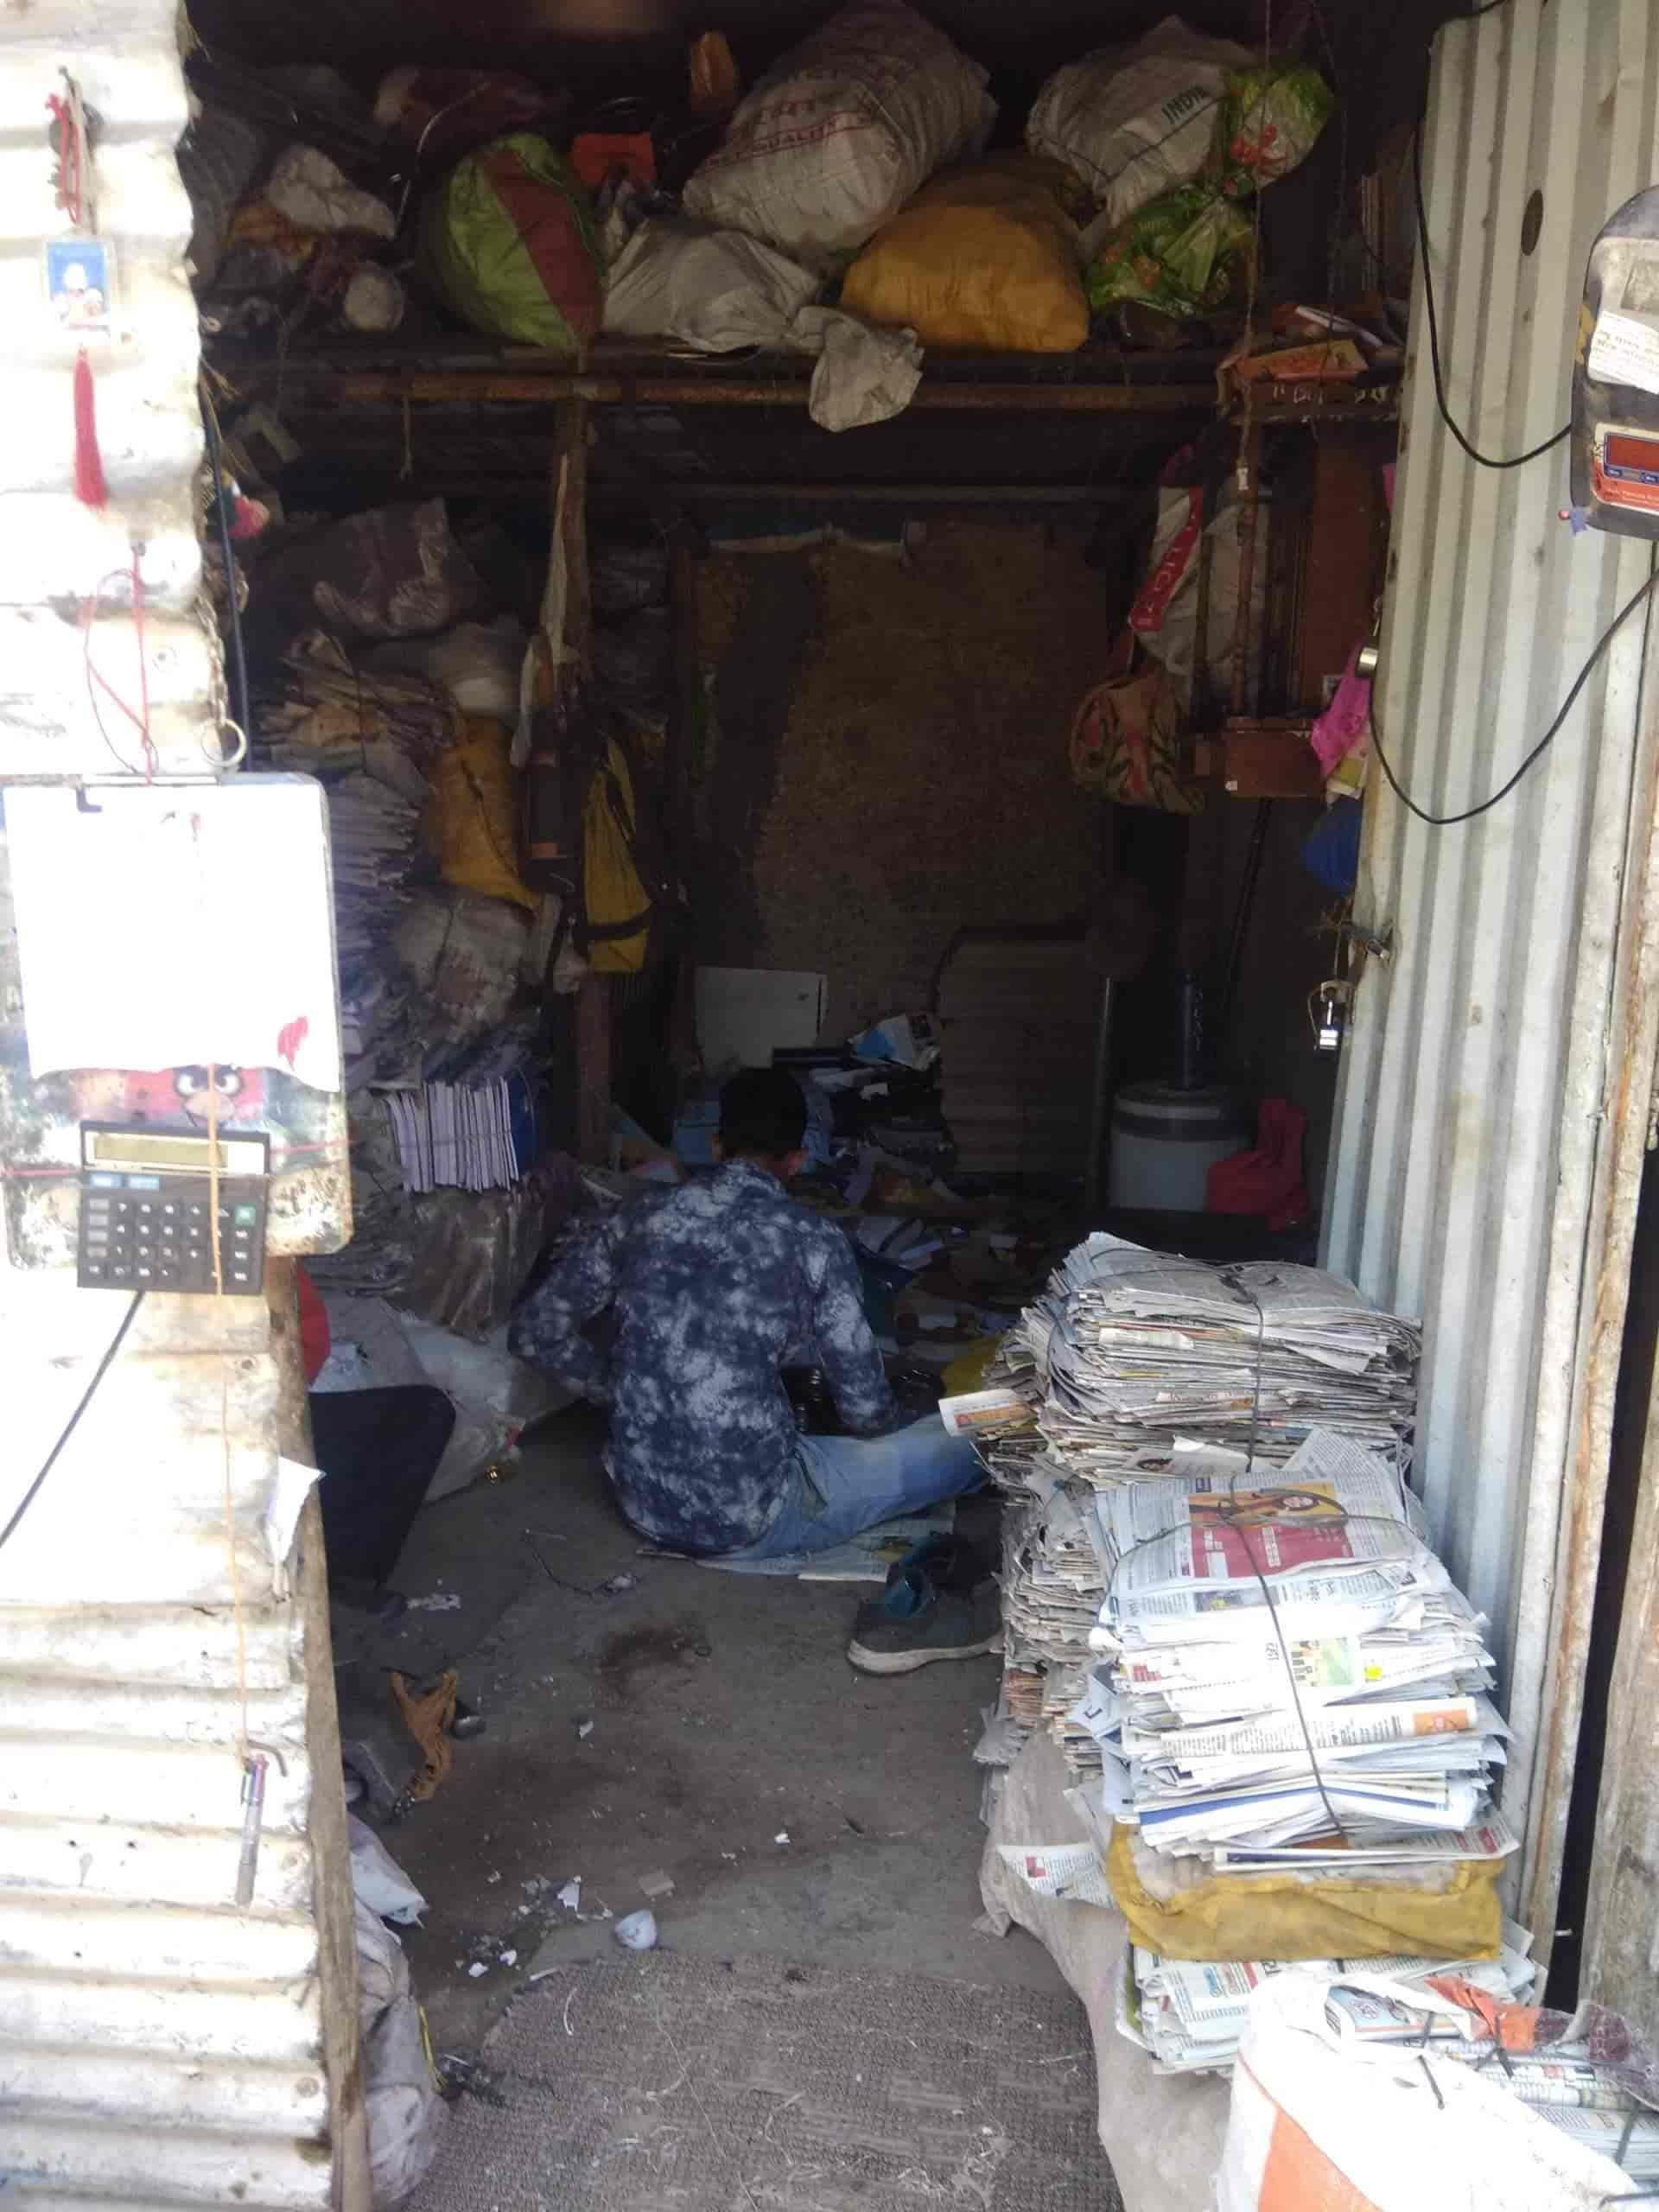 A To Z Scrap Center Photos, Anandwalli Gaon, Nashik